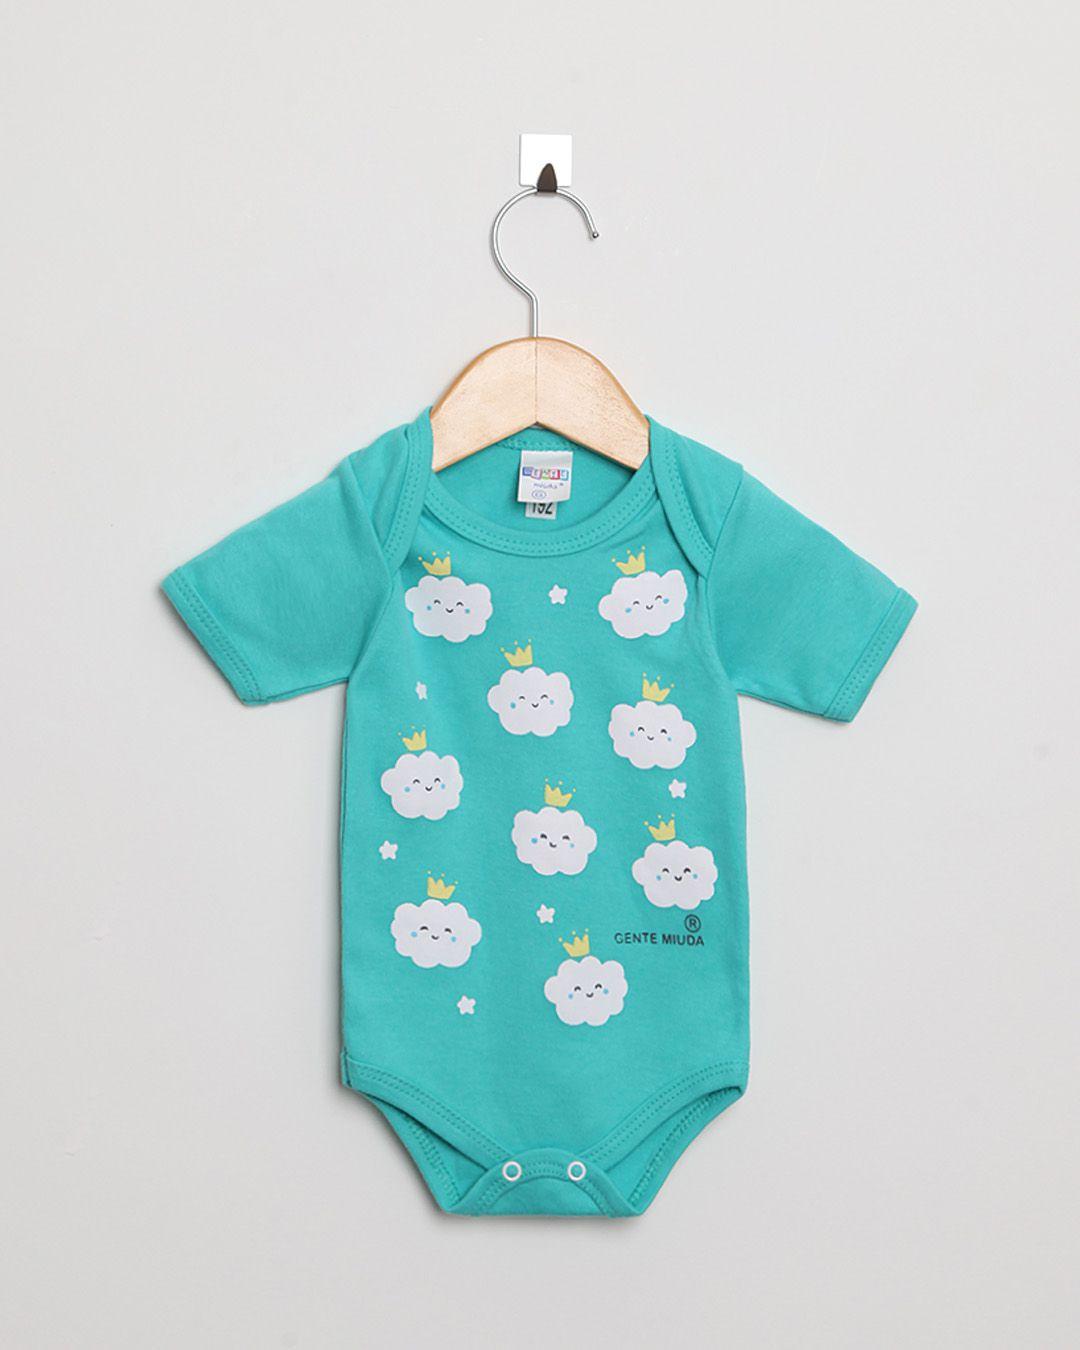 Body Bebê Manga Curta Suedine Menino Turquesa Nuvens